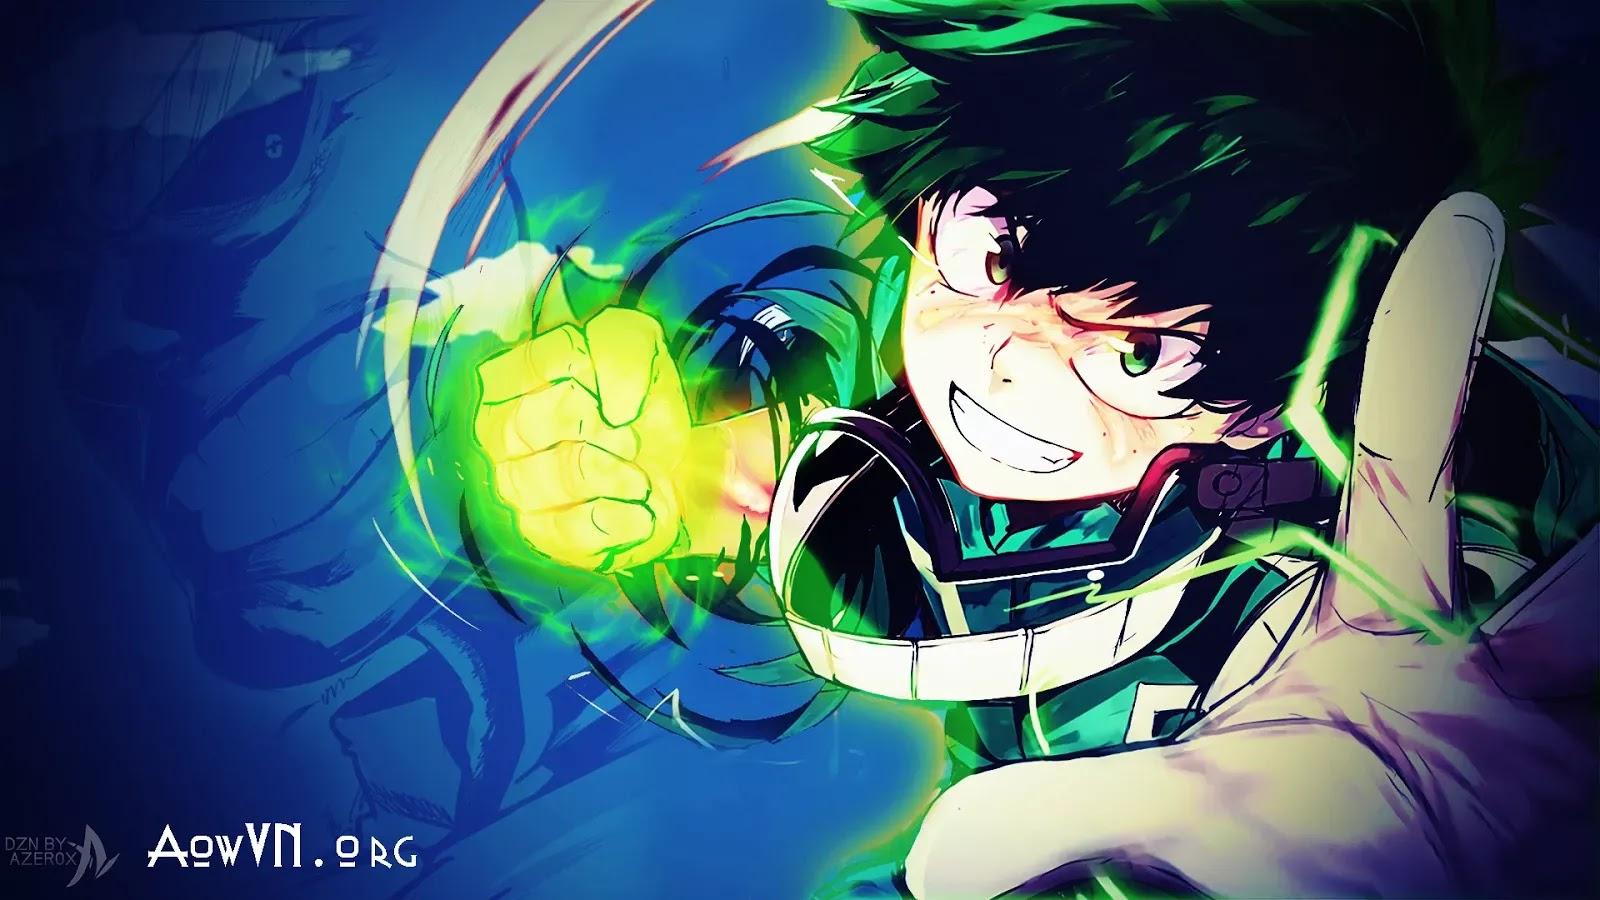 AowVN.org minz%2B%25283%2529 - [ Anime 3gp Mp4 ] Boku No Hero Academia SS1 + SS2 + OVA | Vietsub - Tuyệt Hay